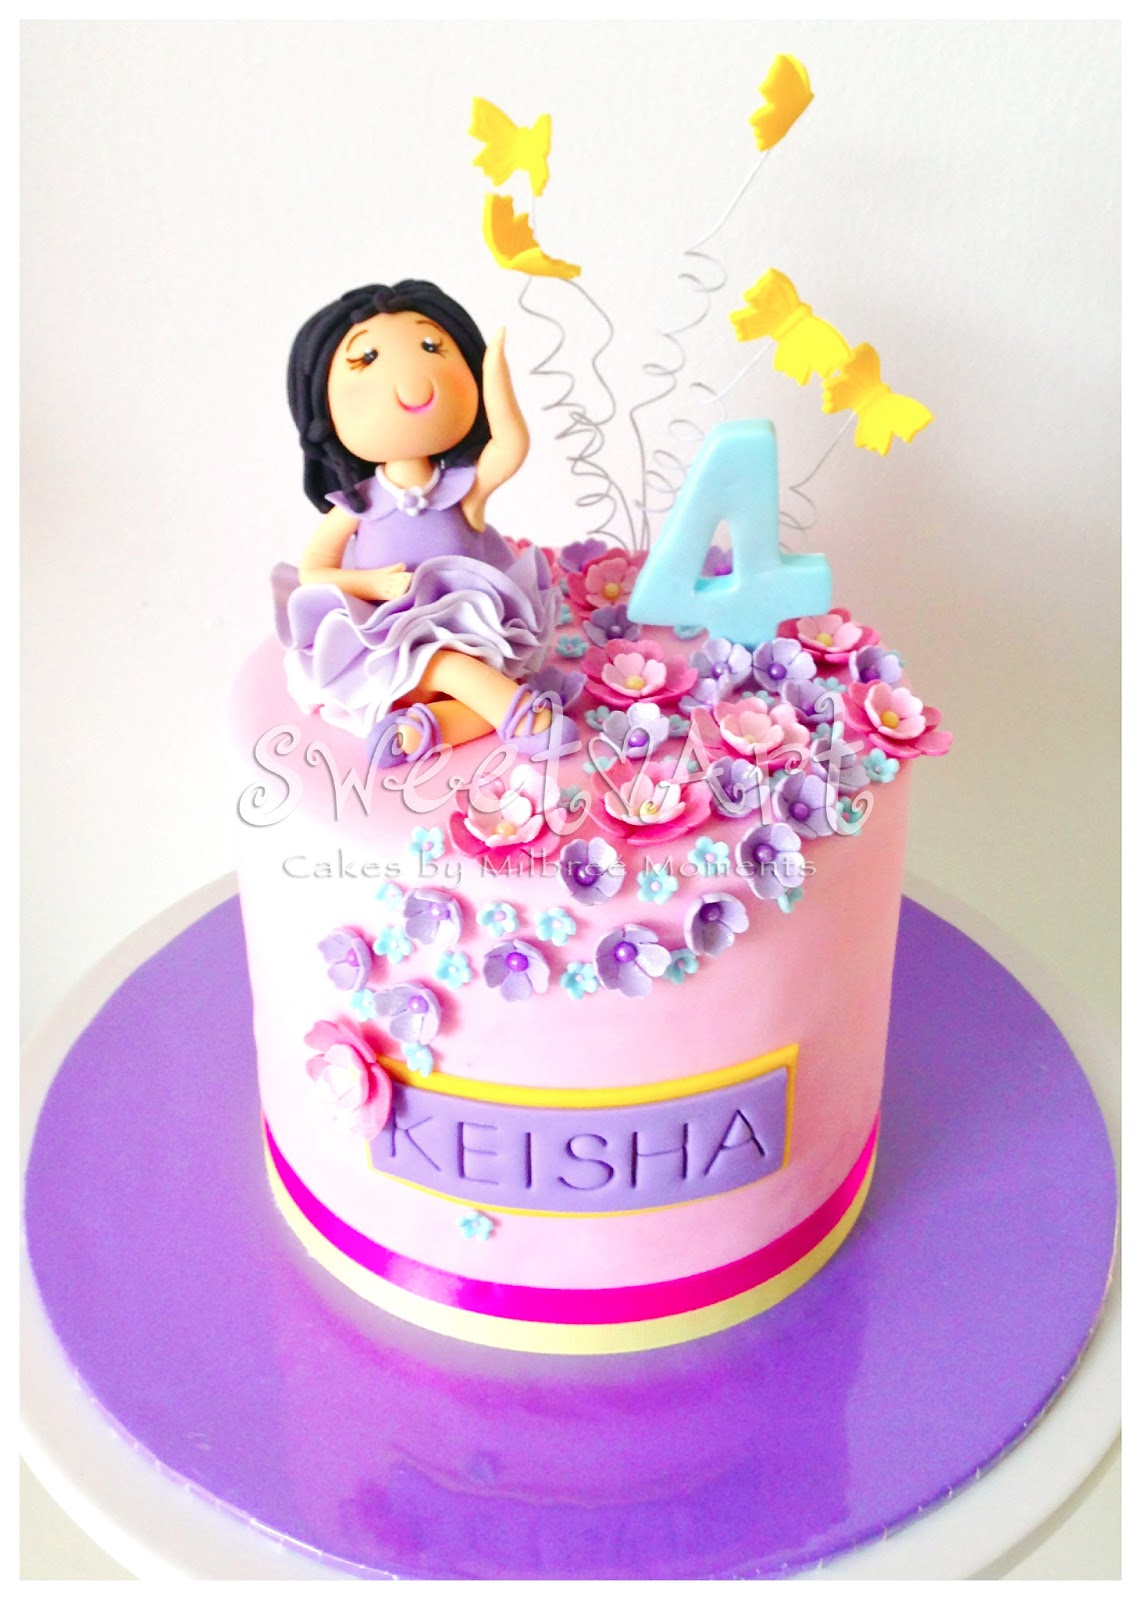 sweet art cakes by milbre233 moments keishas ballerina 4th